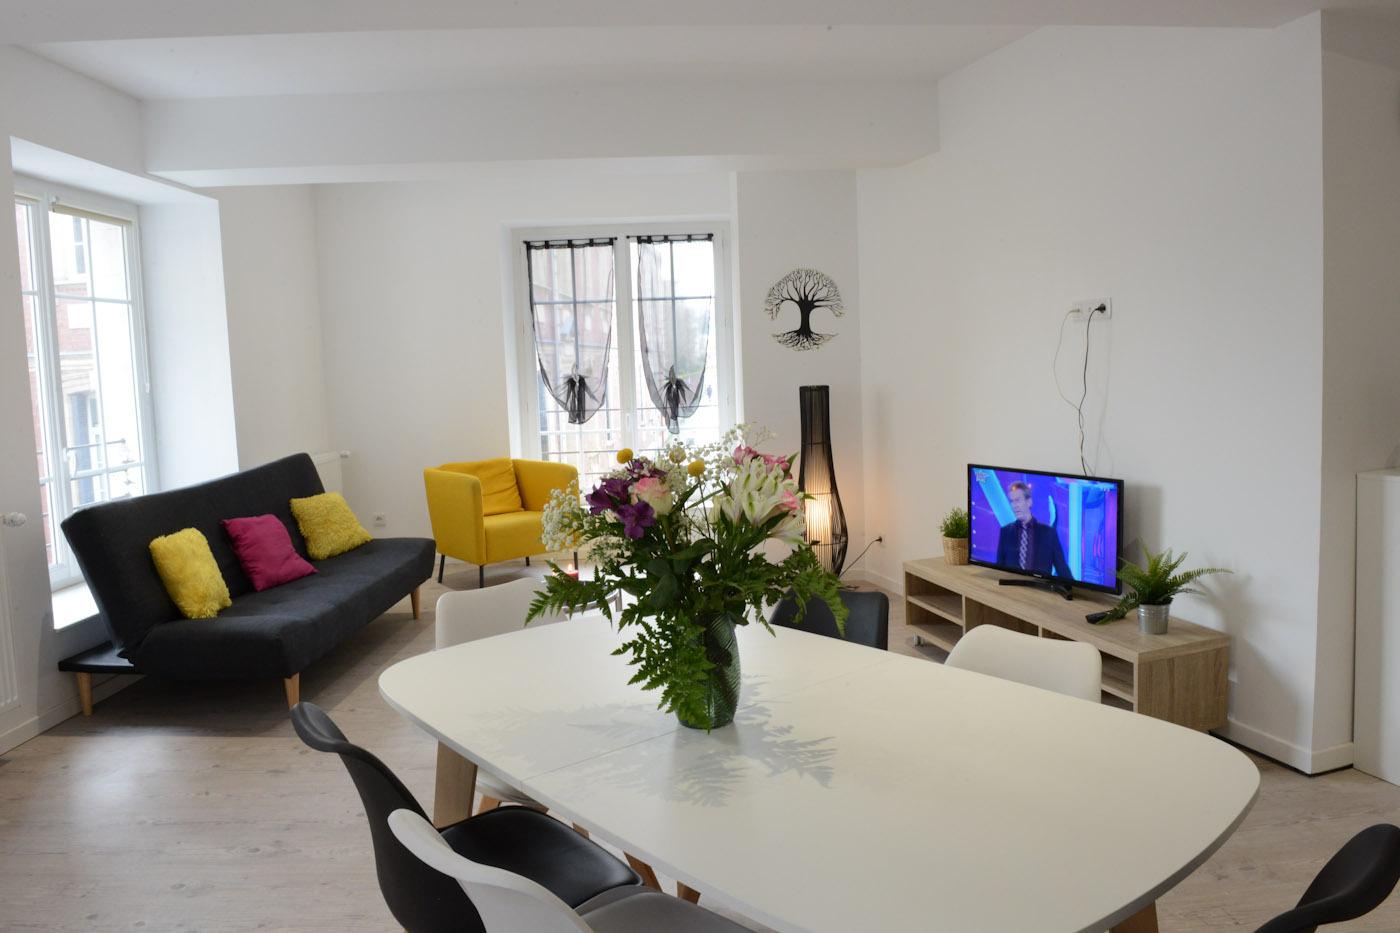 Cuisine Integree Dans Salon appartement rue d'ecosse, dieppe, france - toproomscom